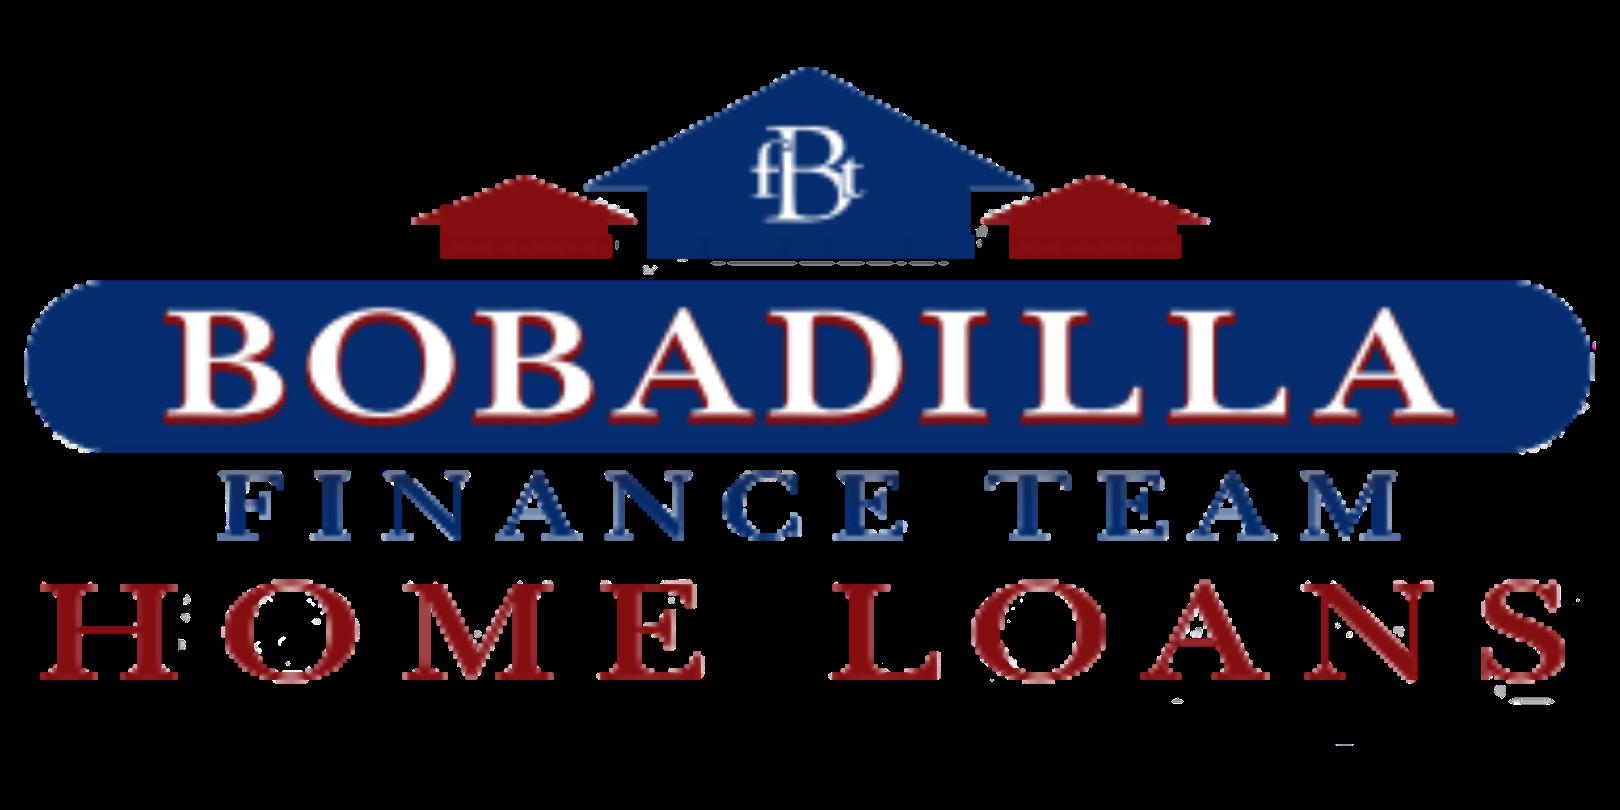 Bobadilla Finance Team Home Loans logo